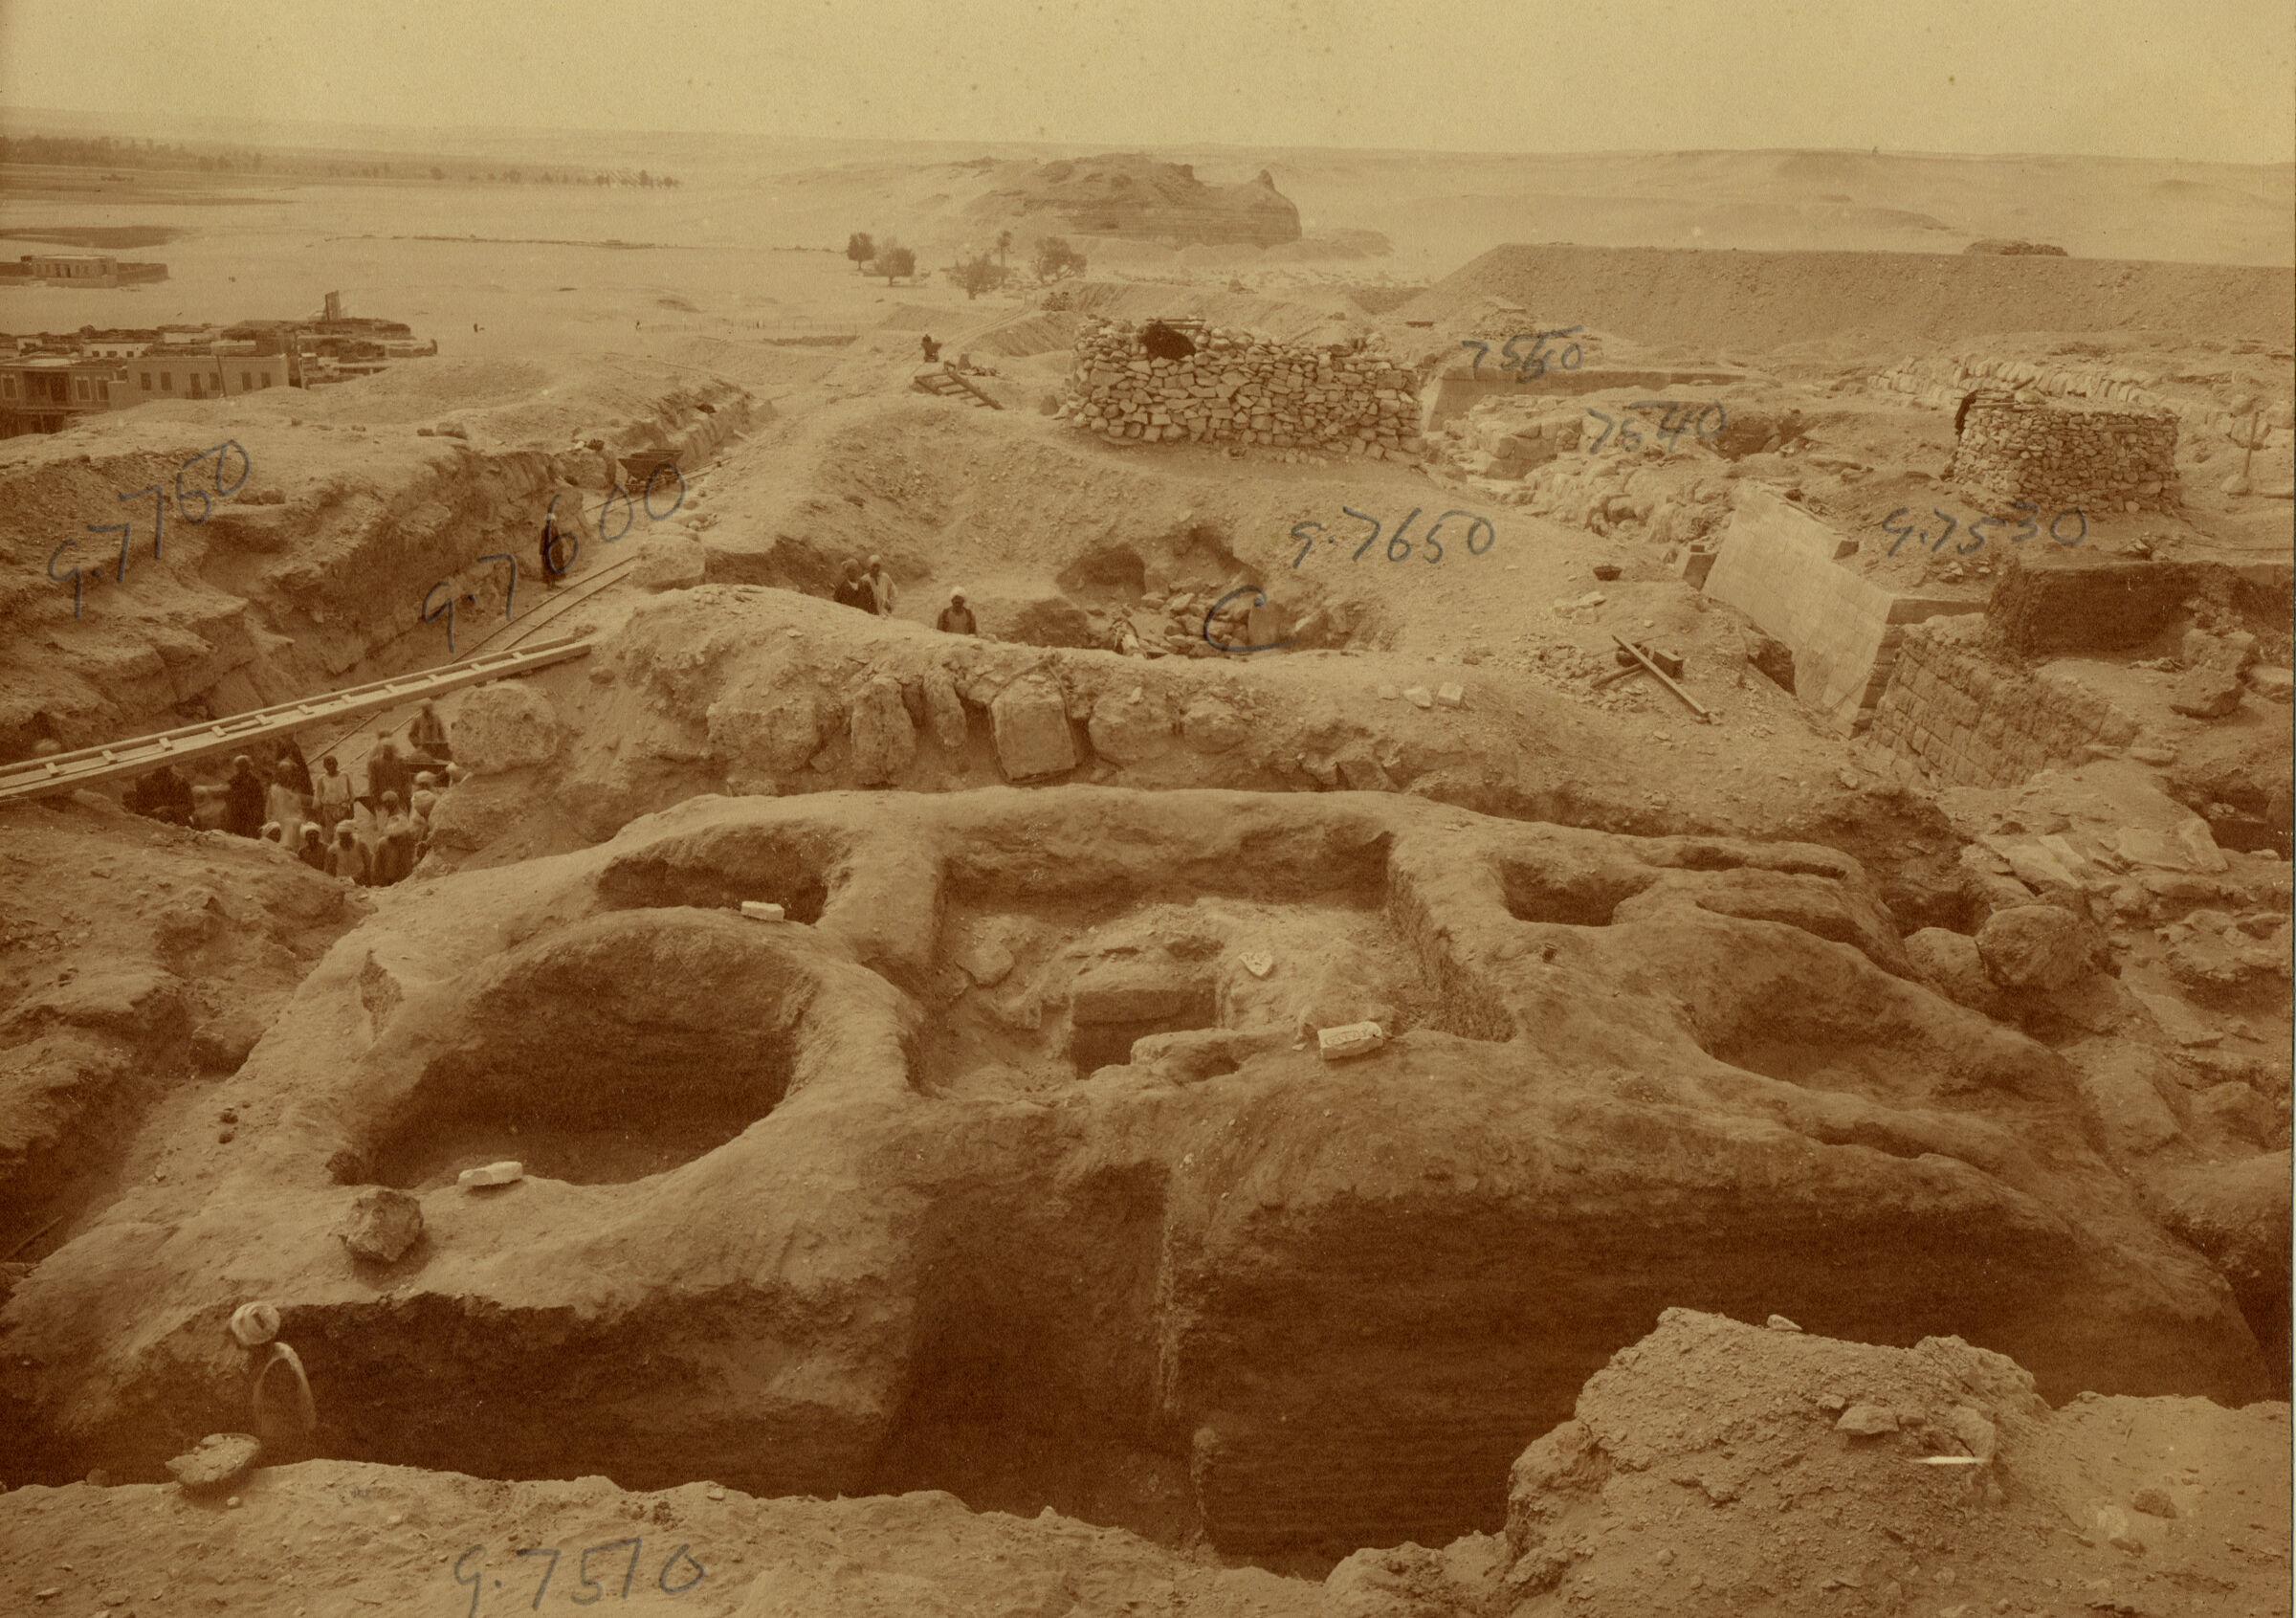 Eastern Cemetery: Site: Giza; View: G 7750, street G 7600, G 7650, G 7530-7540, G 7550